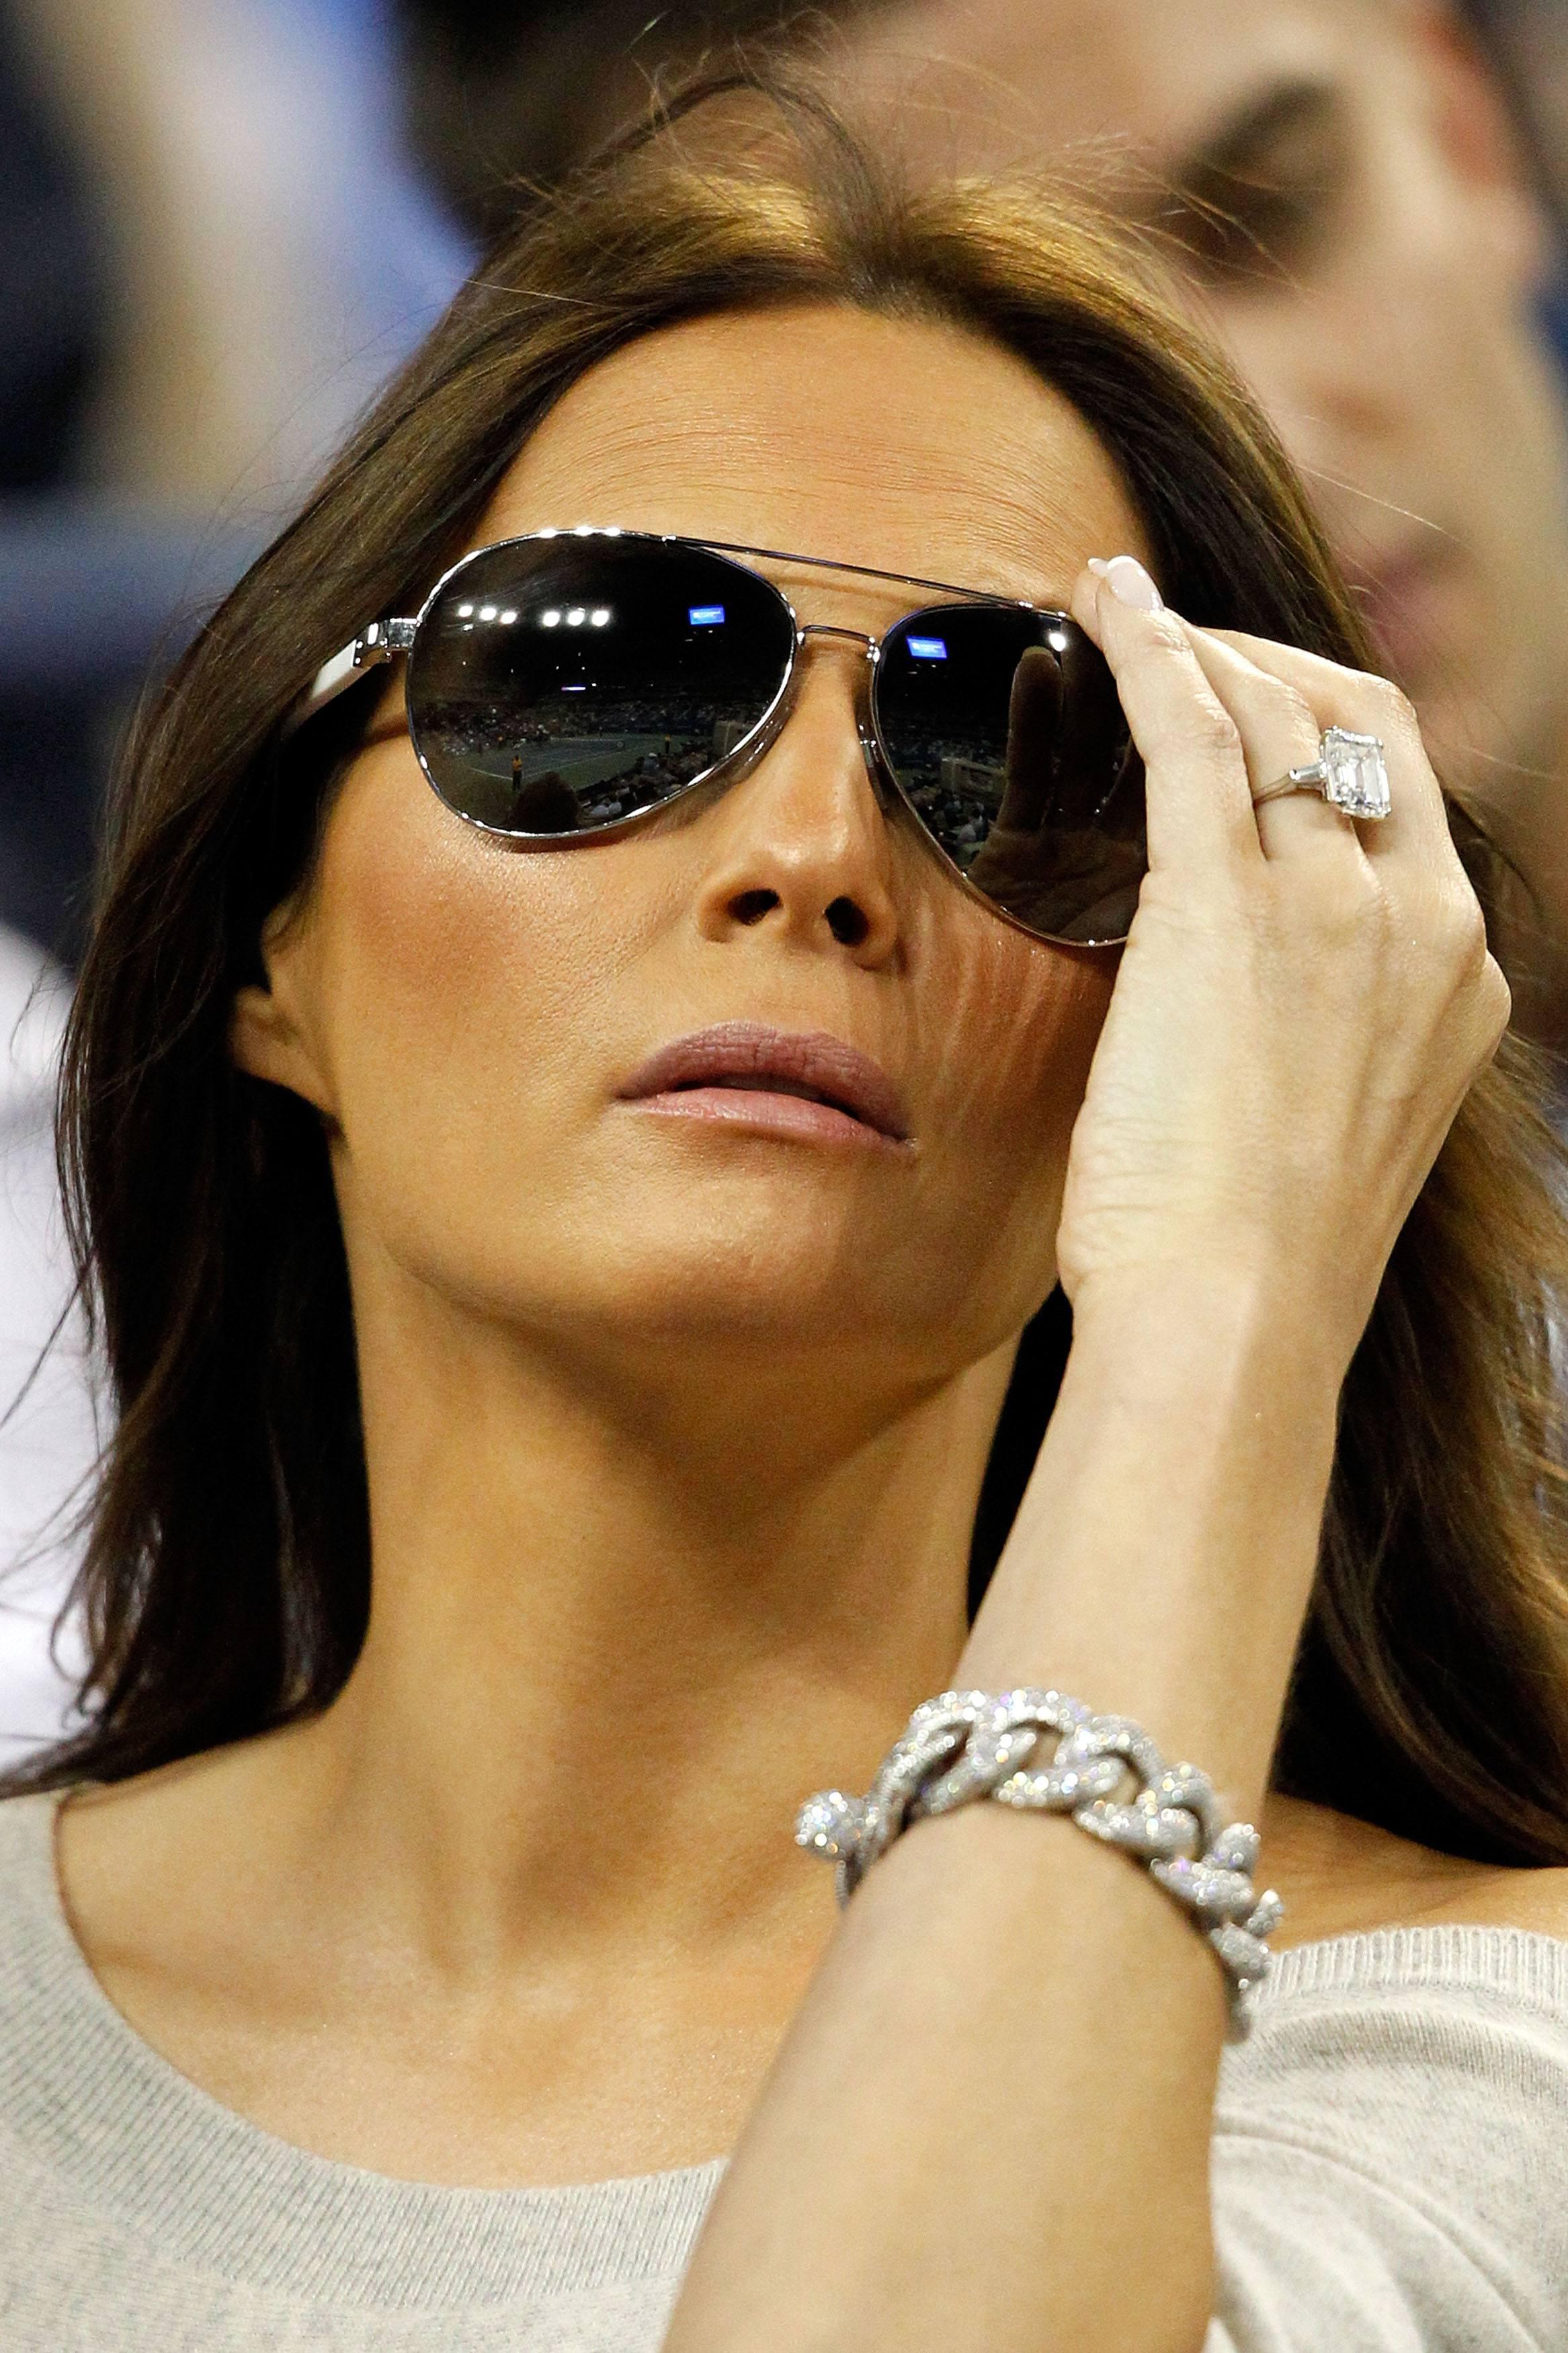 Melania Trump 25 carat ring